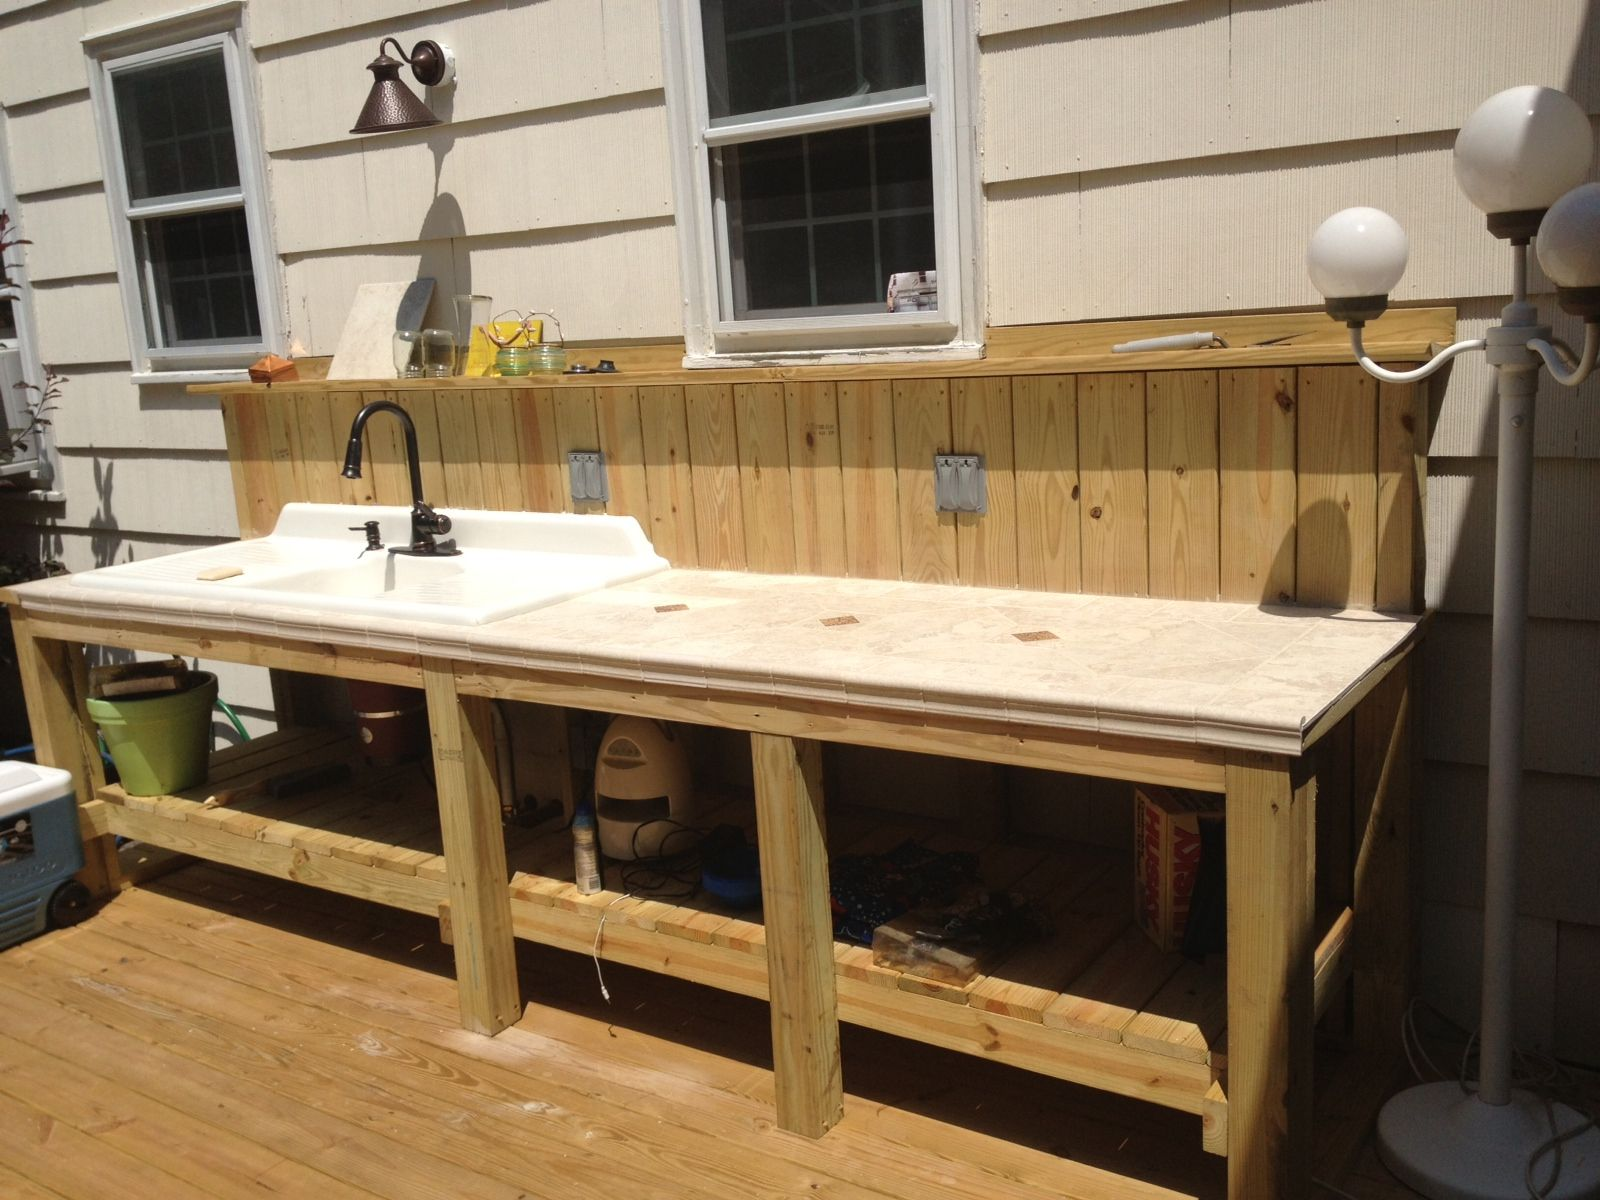 Outdoor Kitchen With Sink My Simple Outdoor Sink Deck